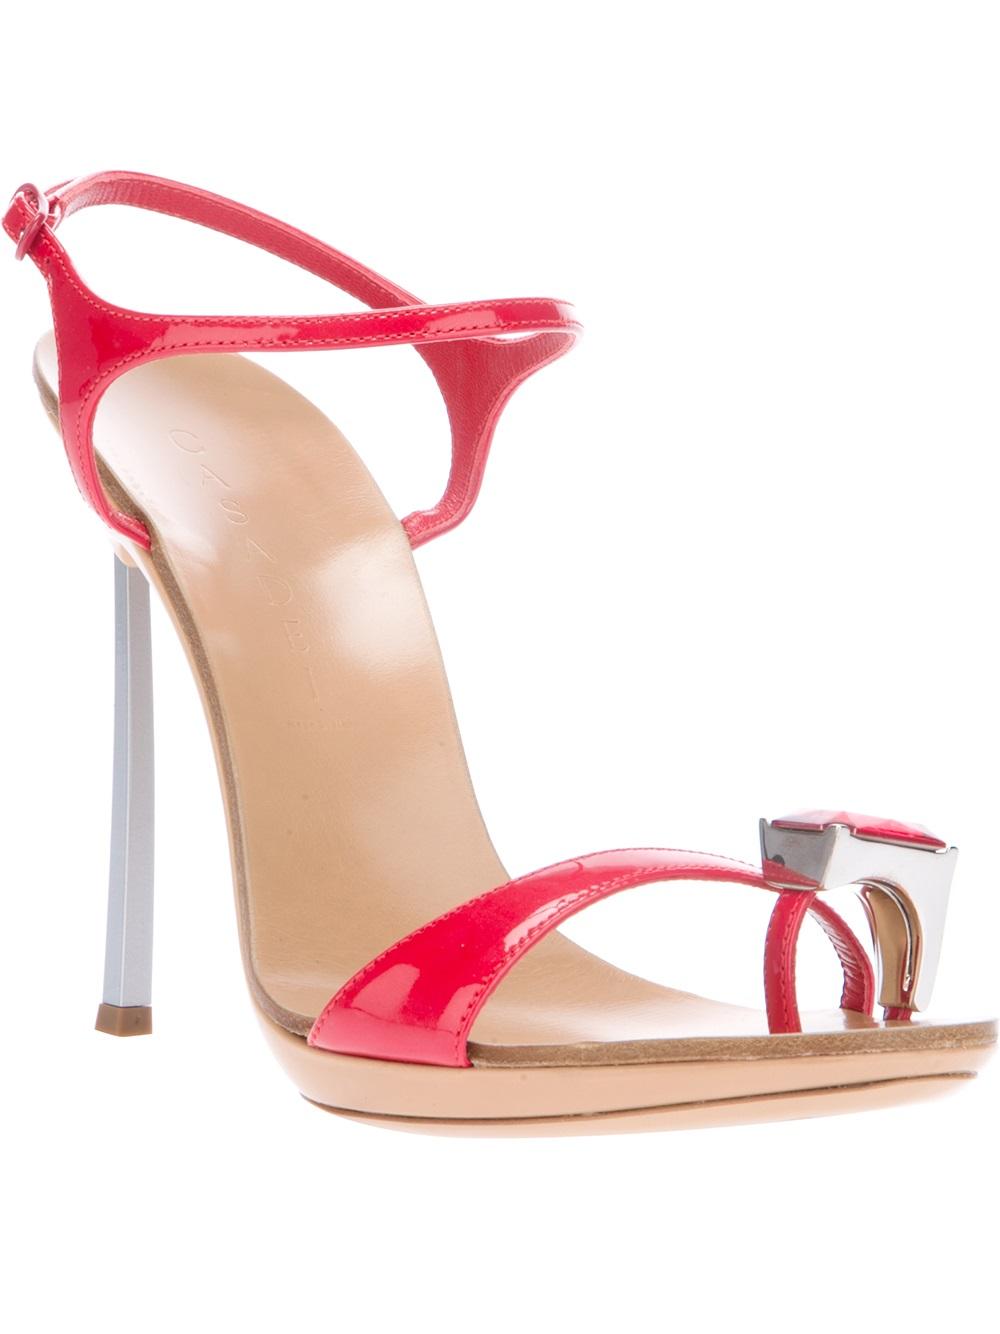 Lyst Casadei Stiletto Sandal In Red